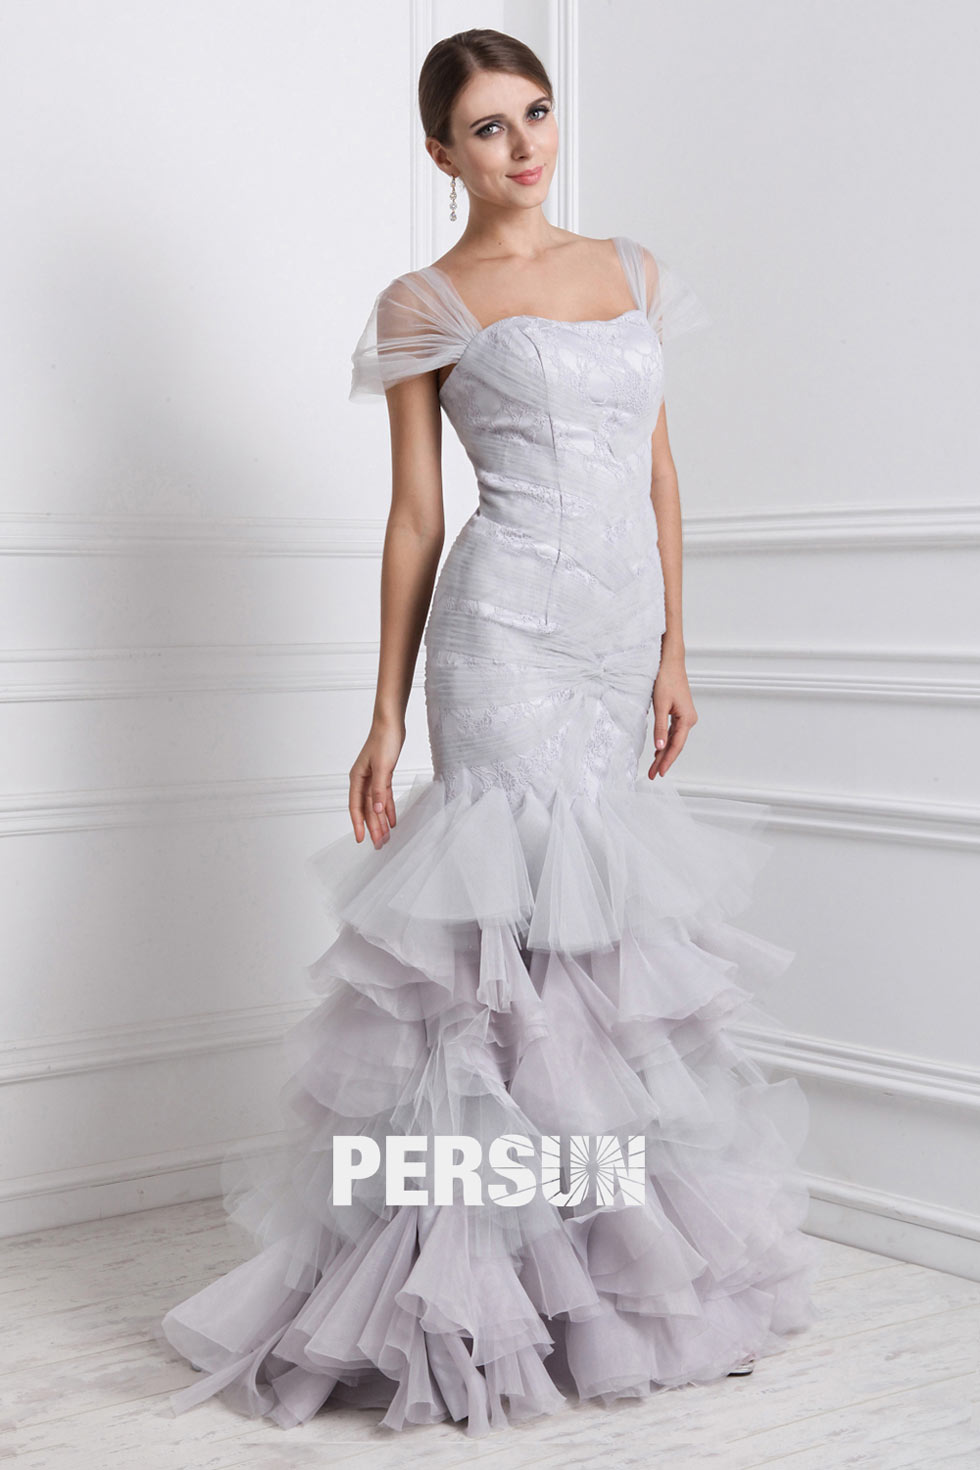 robe sirène à volants avec mancheron